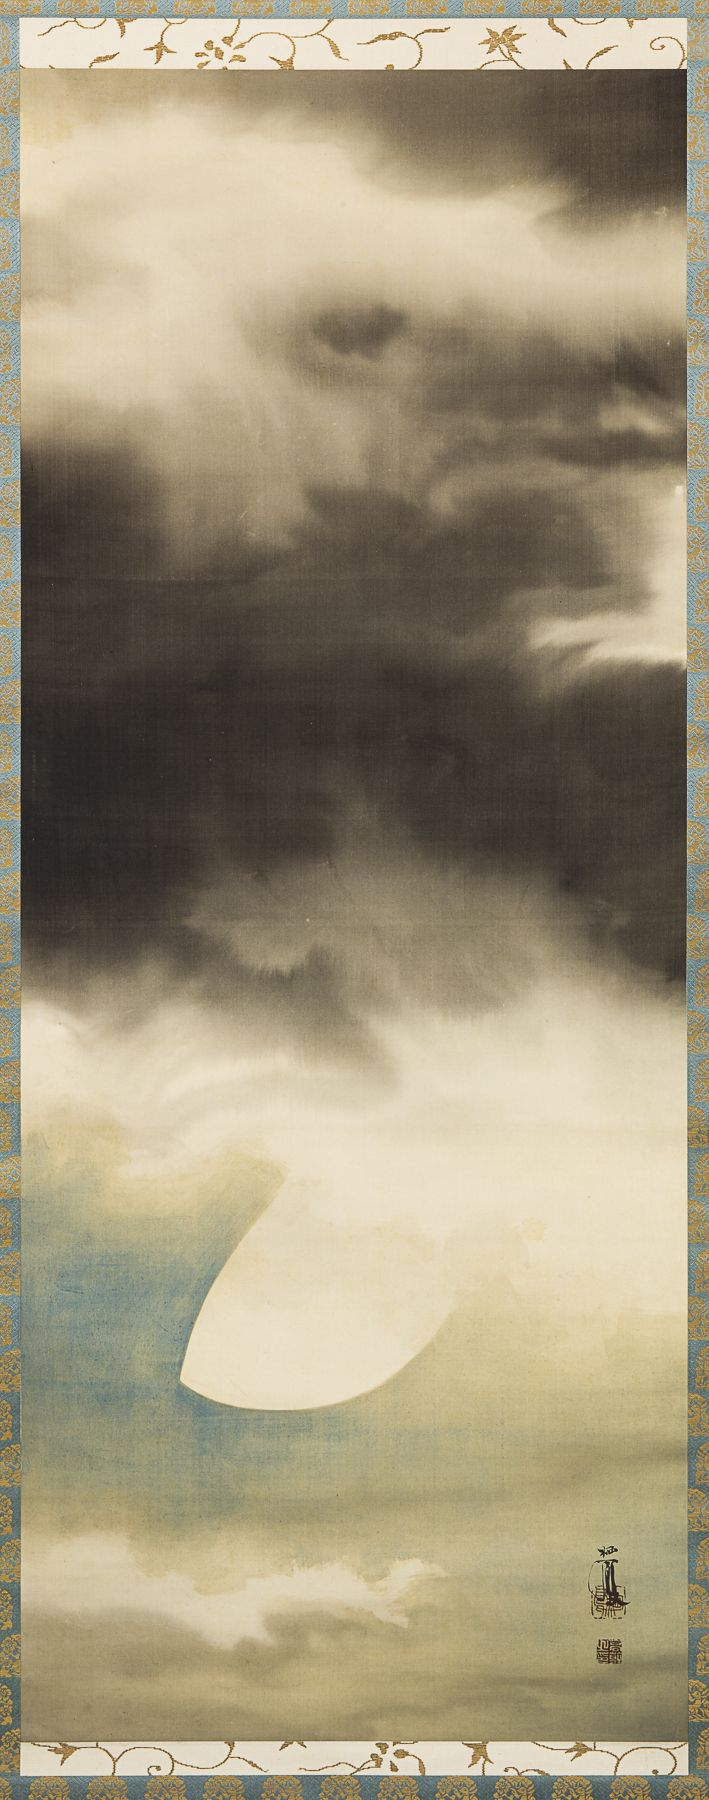 Takeuchi Seihō (1864-1942), View of the Summer Moon